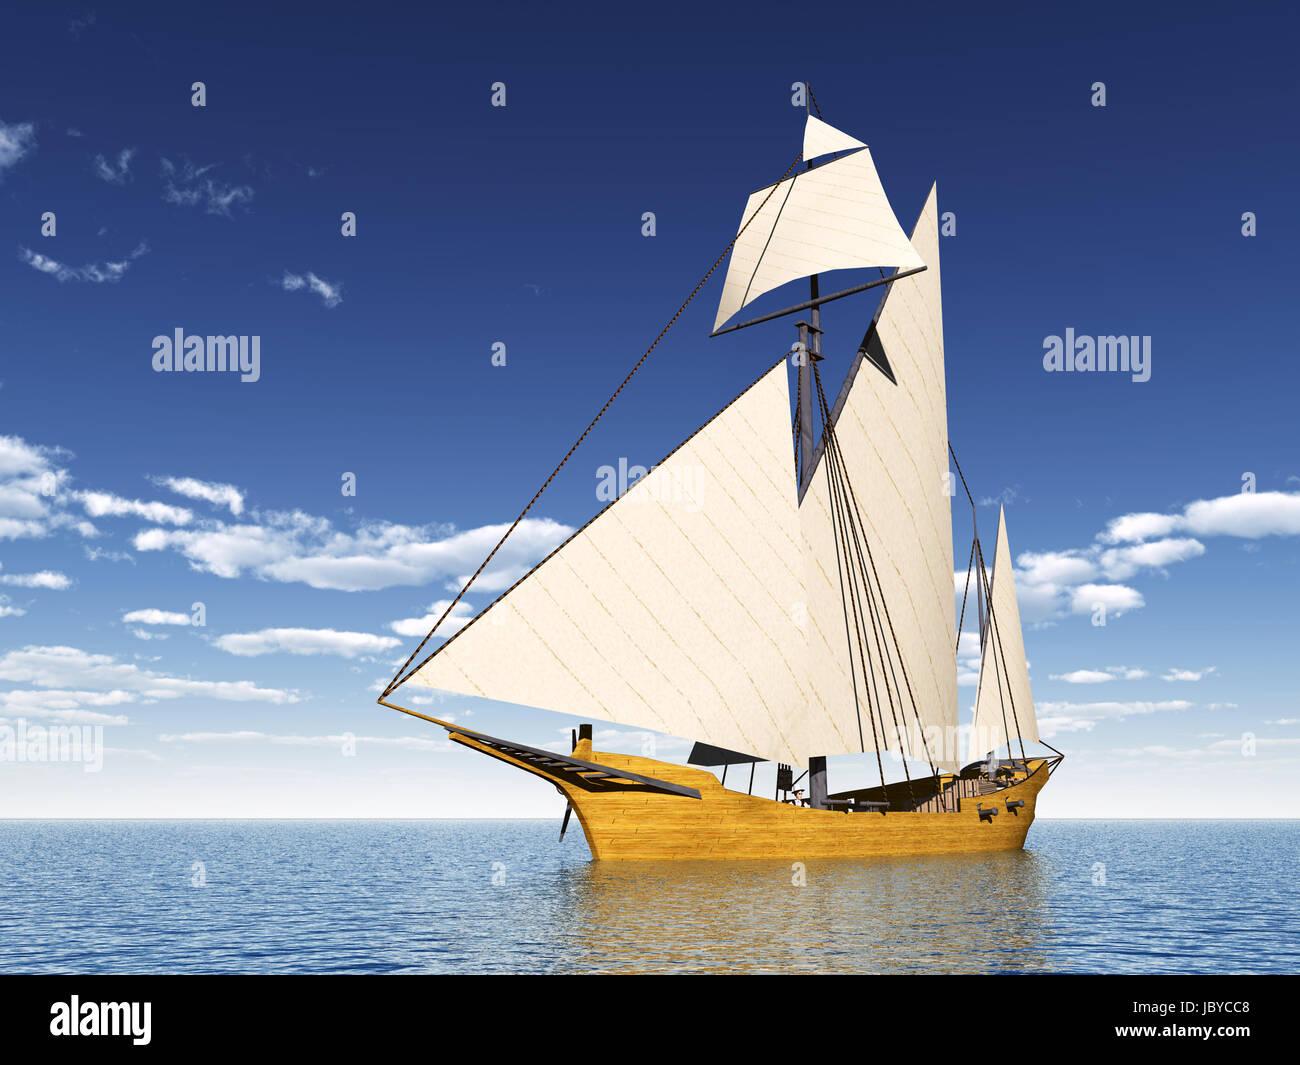 caravel - Stock Image